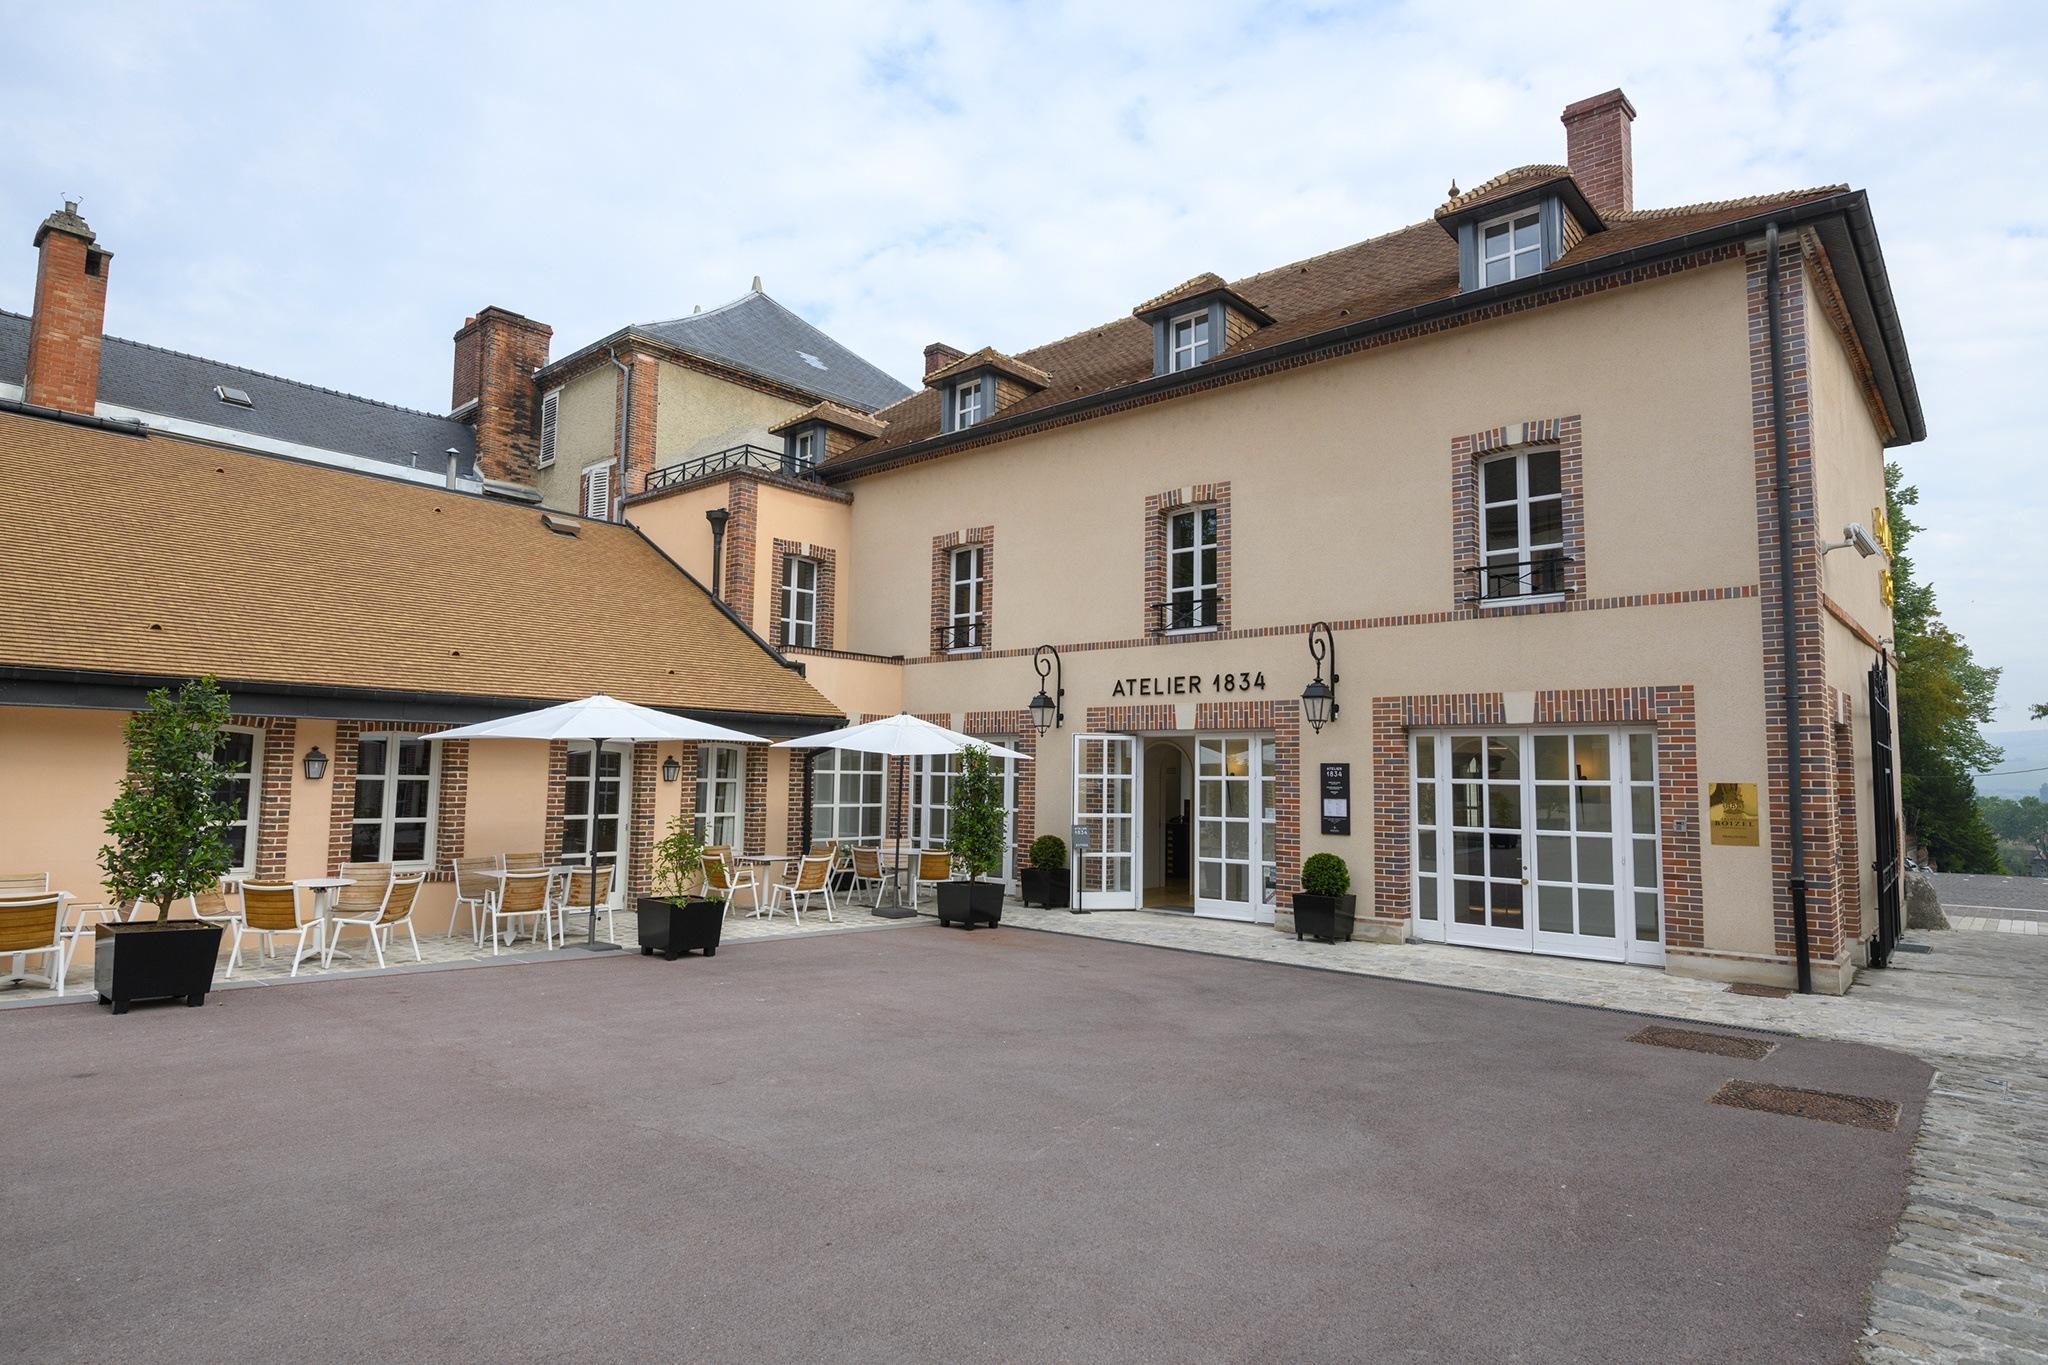 L'Atelier 1834 - Champagne Boizel - Epernay France